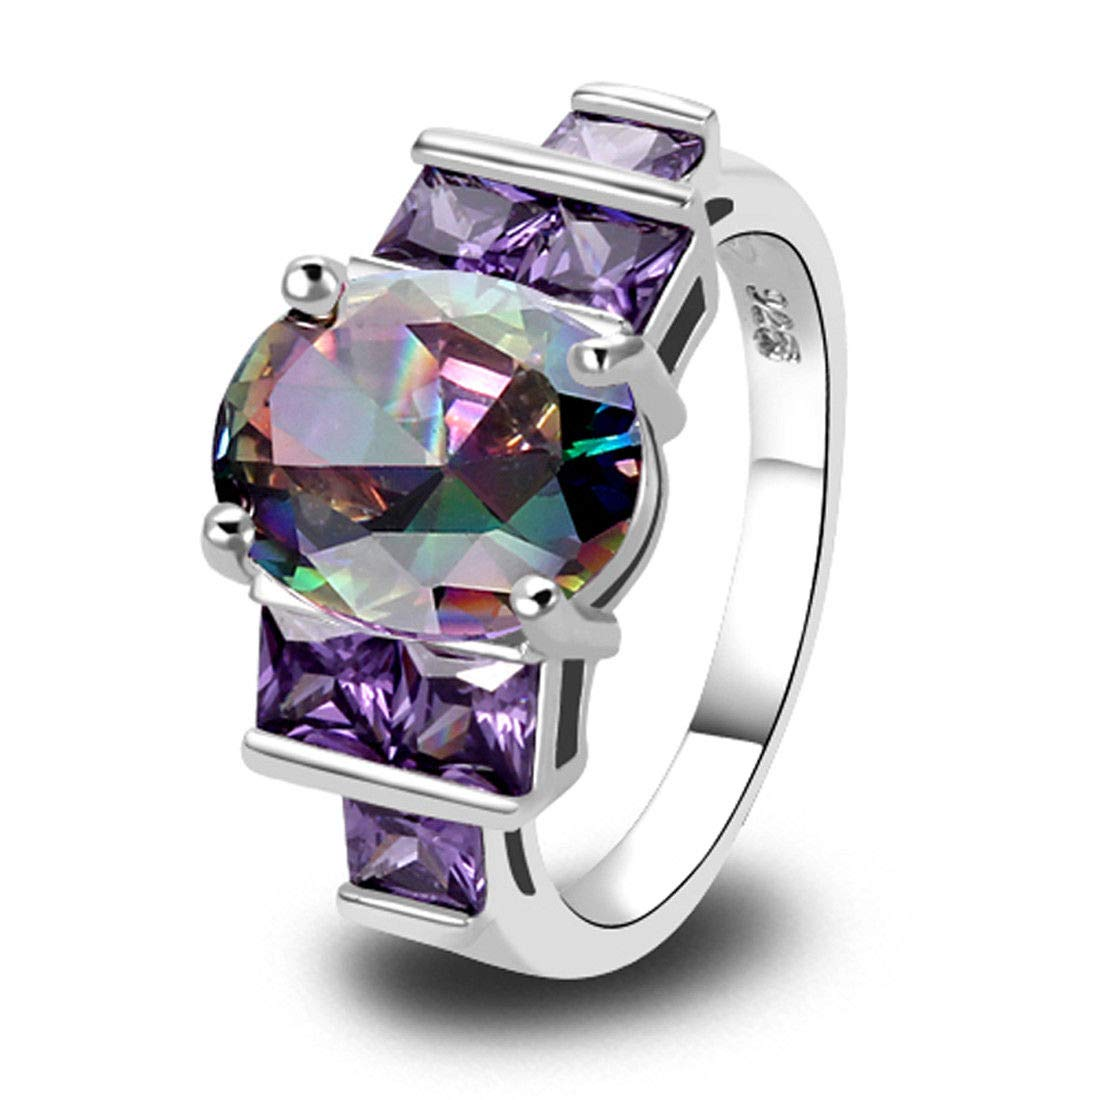 T-Jewelry Cocktail Rainbow Topaz /& Amethyst Gemstone Silver Ring Size 6 7 8 9 10 8